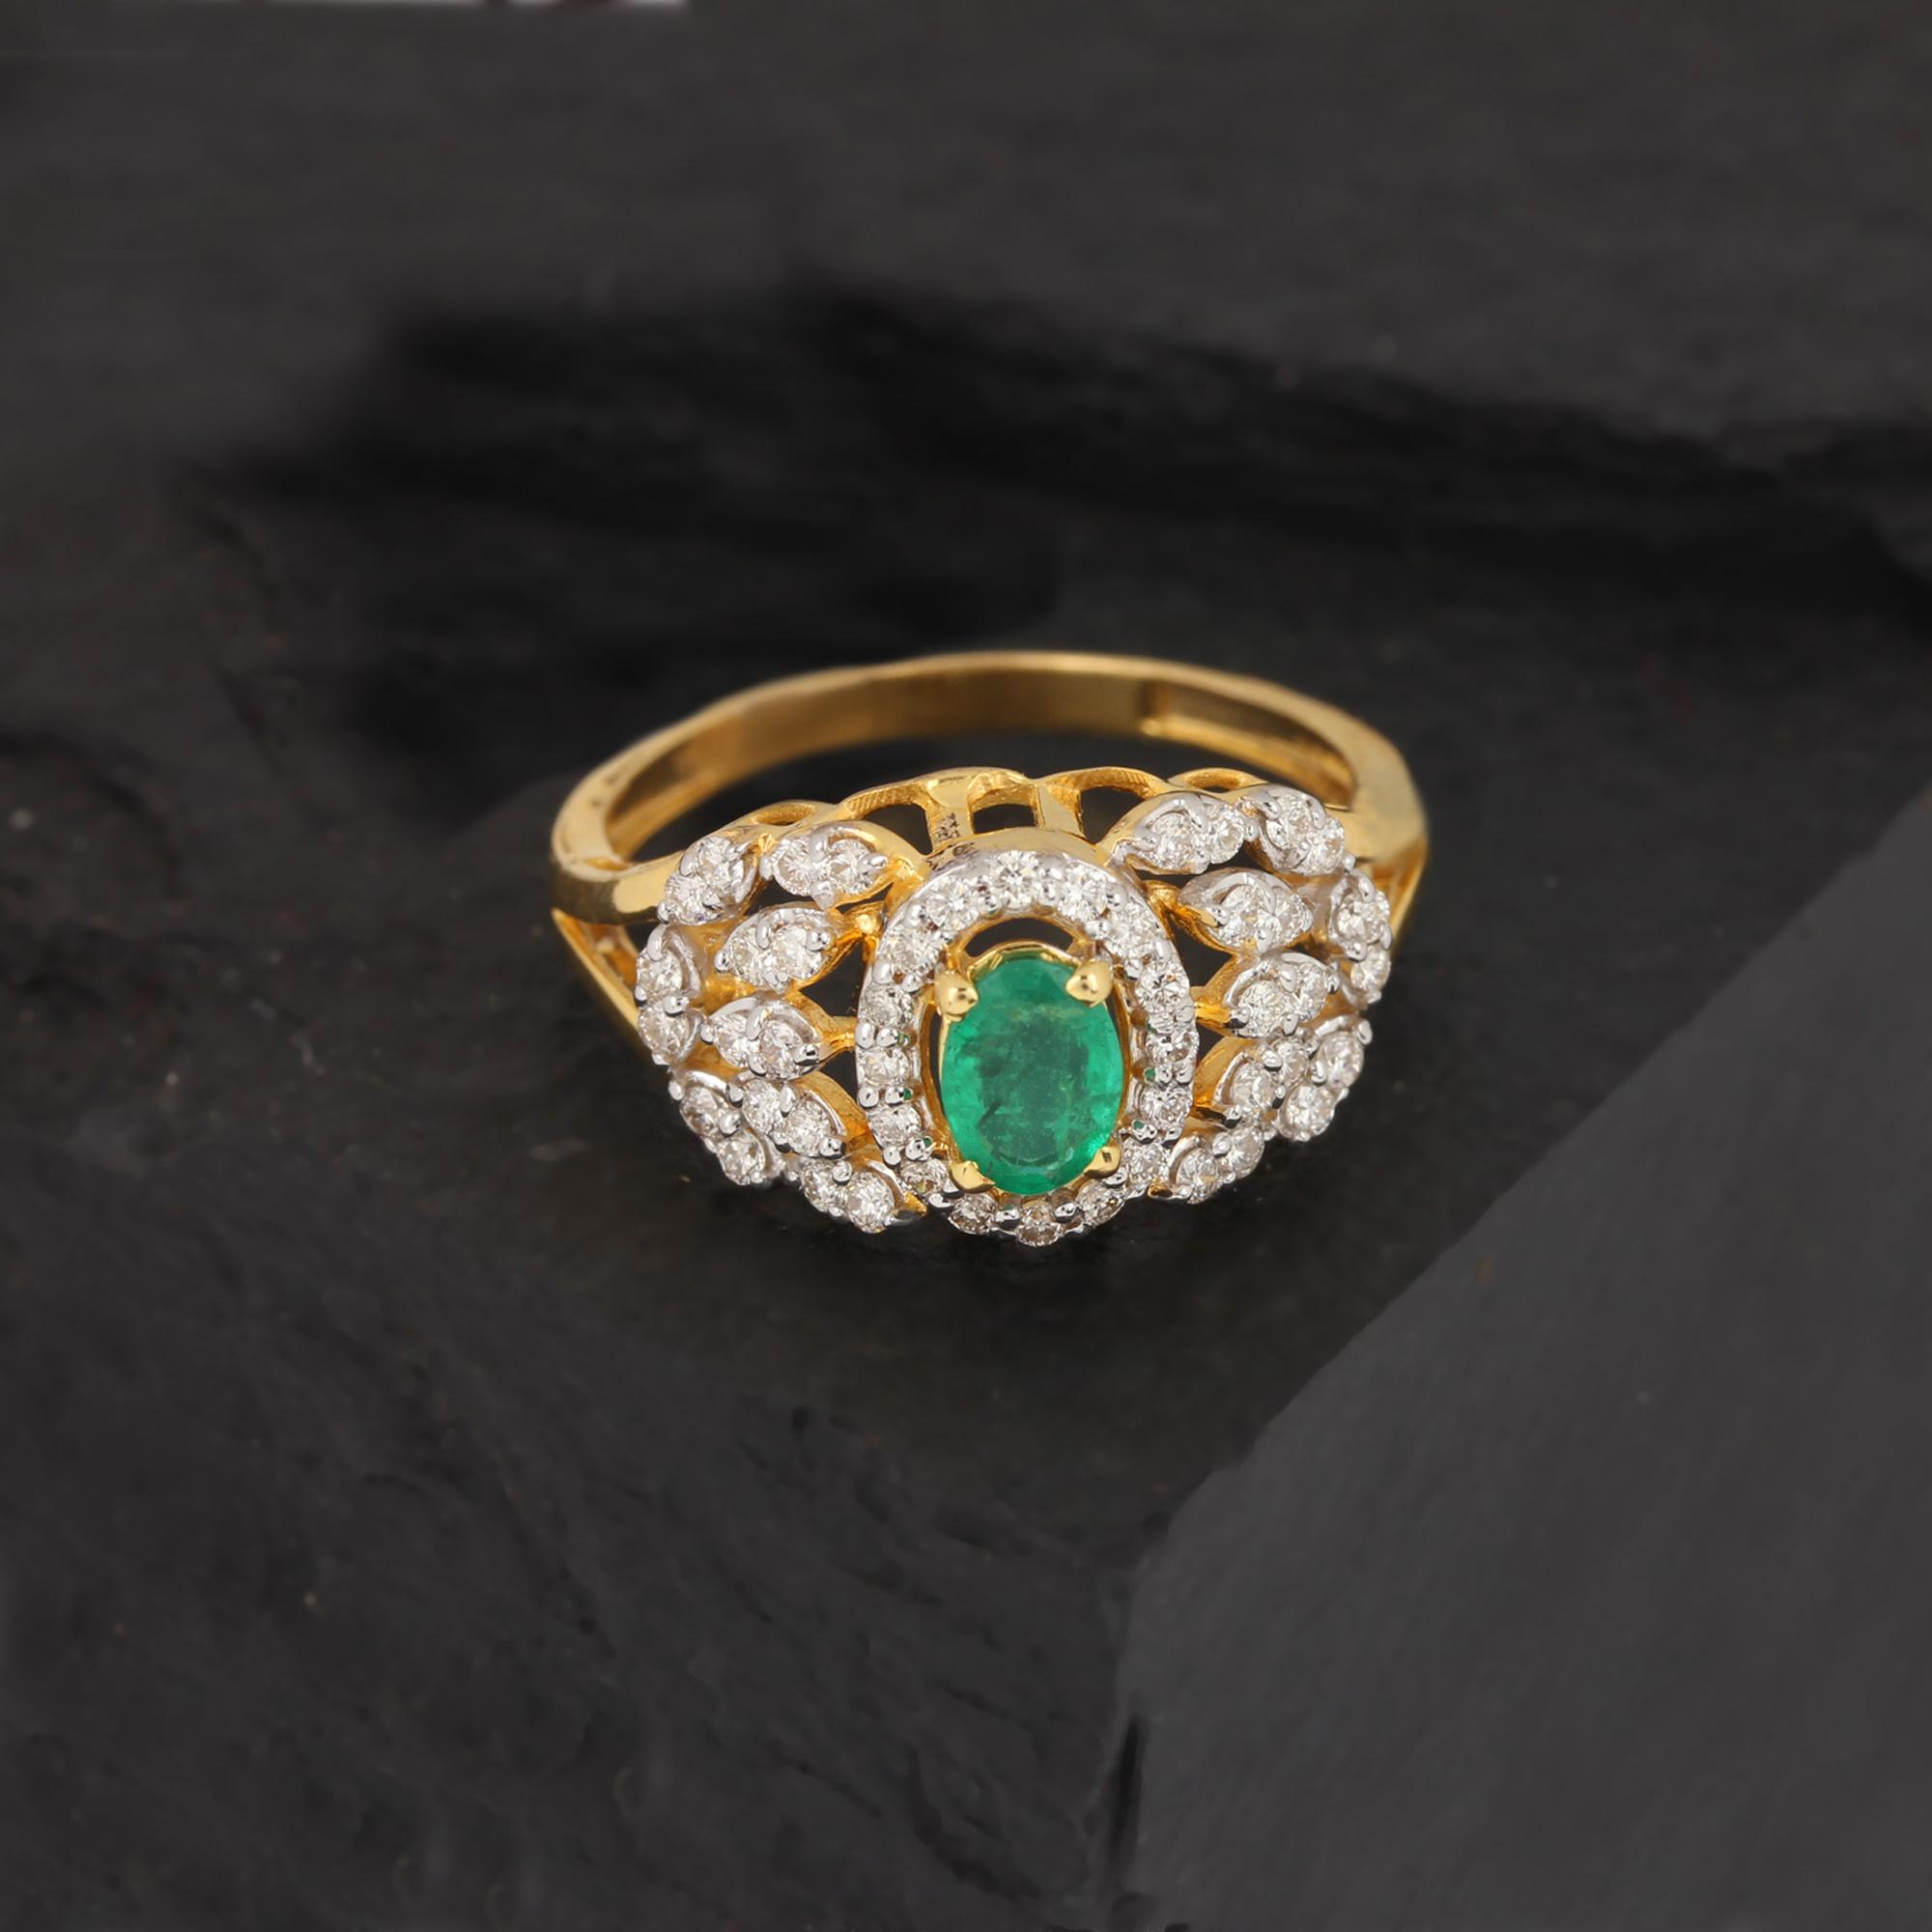 Beautiful ring with diamond-emerald